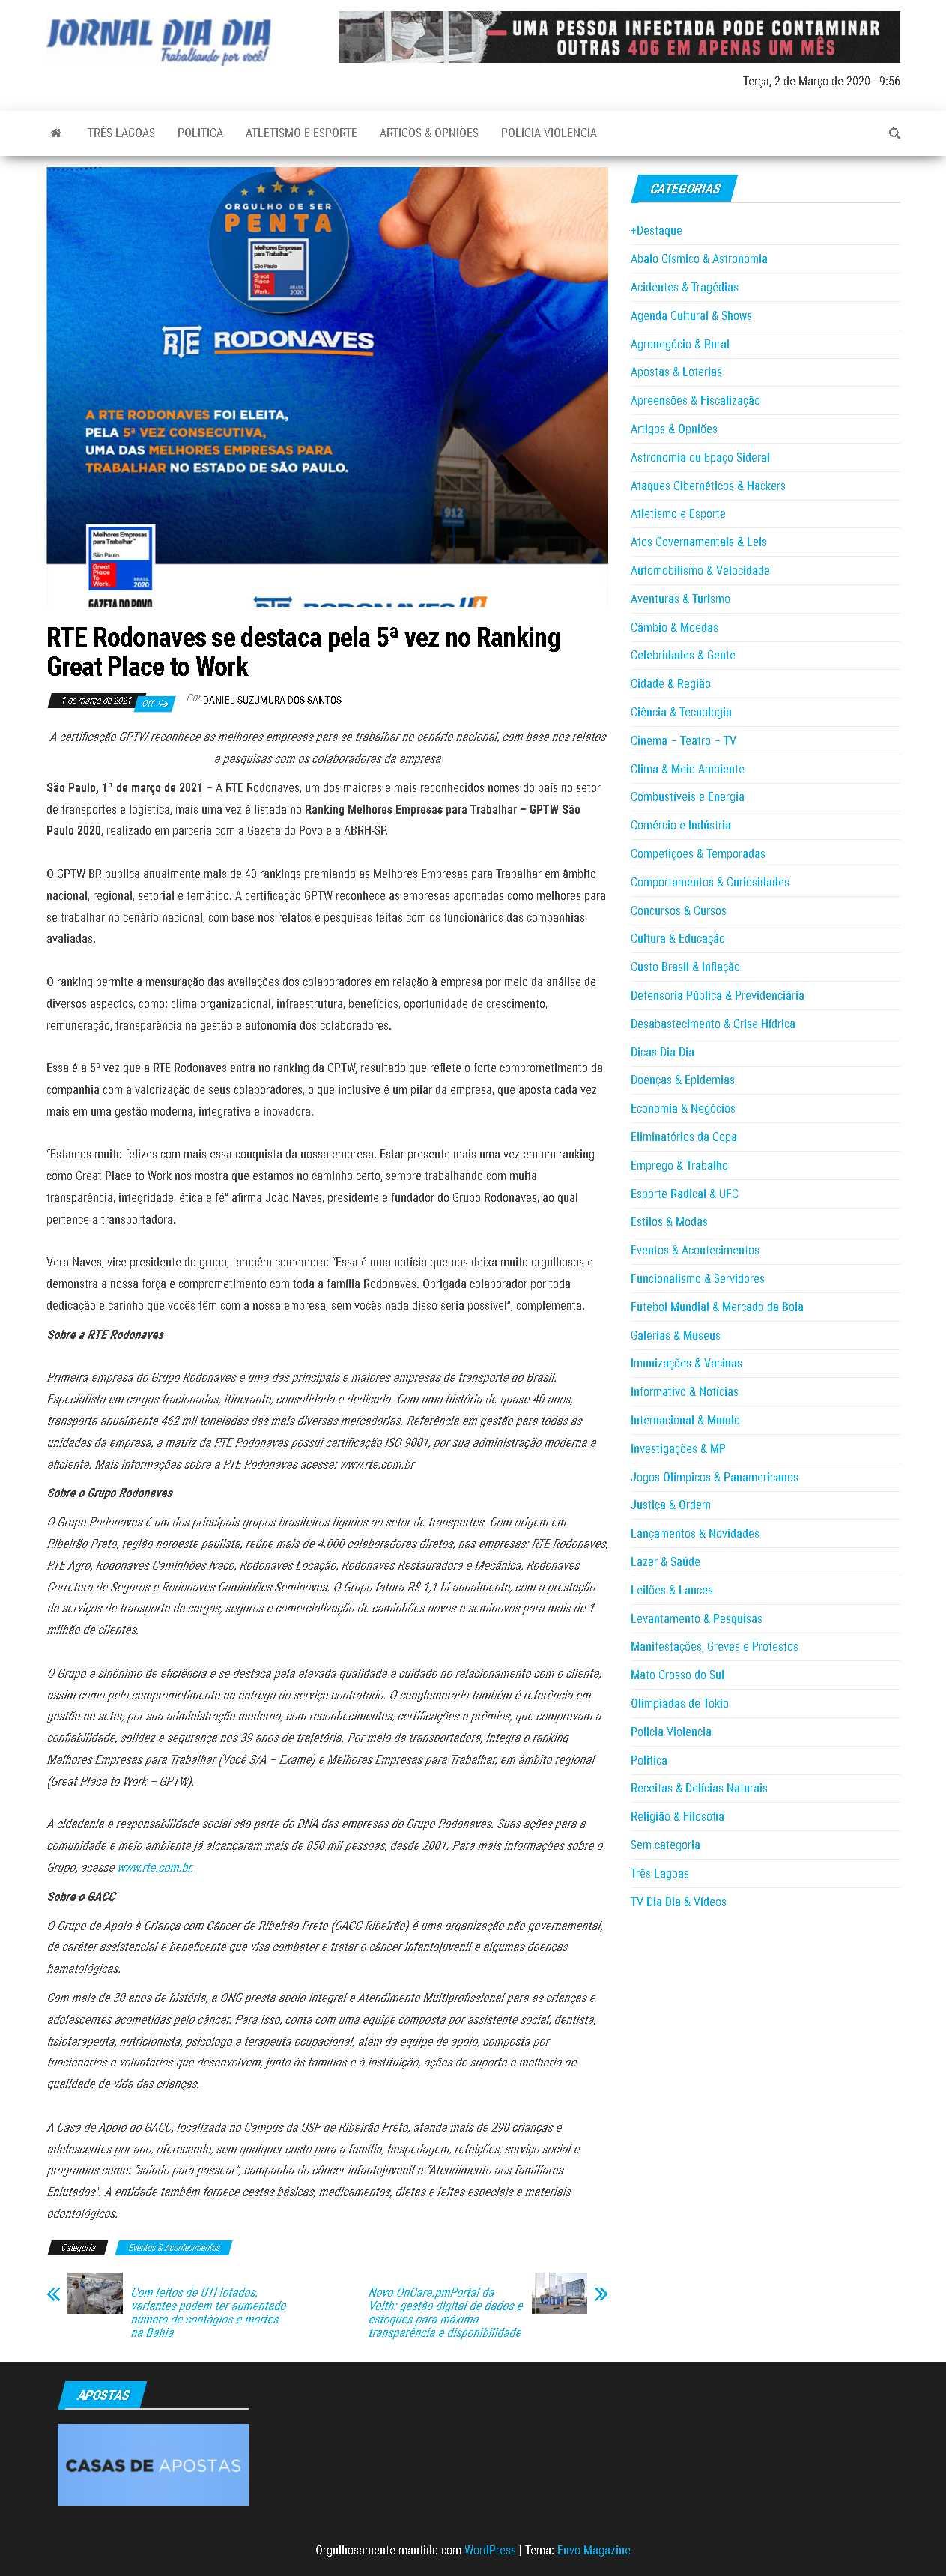 RTE Rodonaves se destaca pela 5ª vez no Ranking Great Place to Work - Jornal Dia a Dia